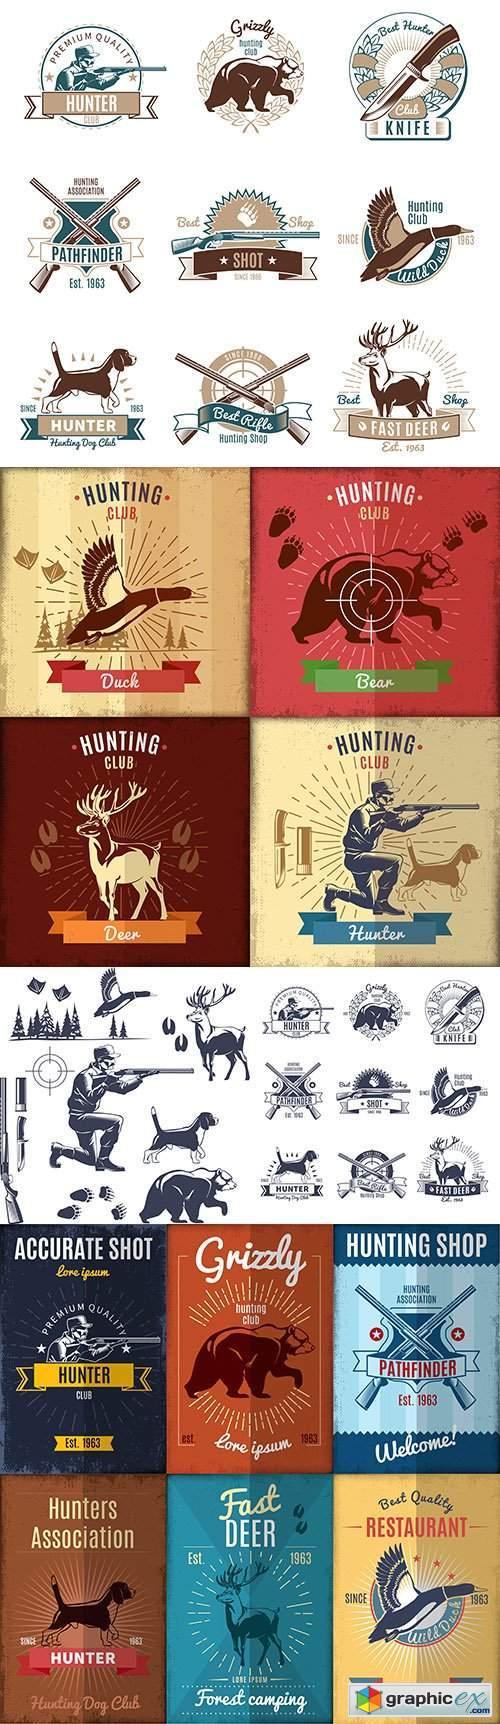 Hunting wild animals and birds design emblem and logo club vintage